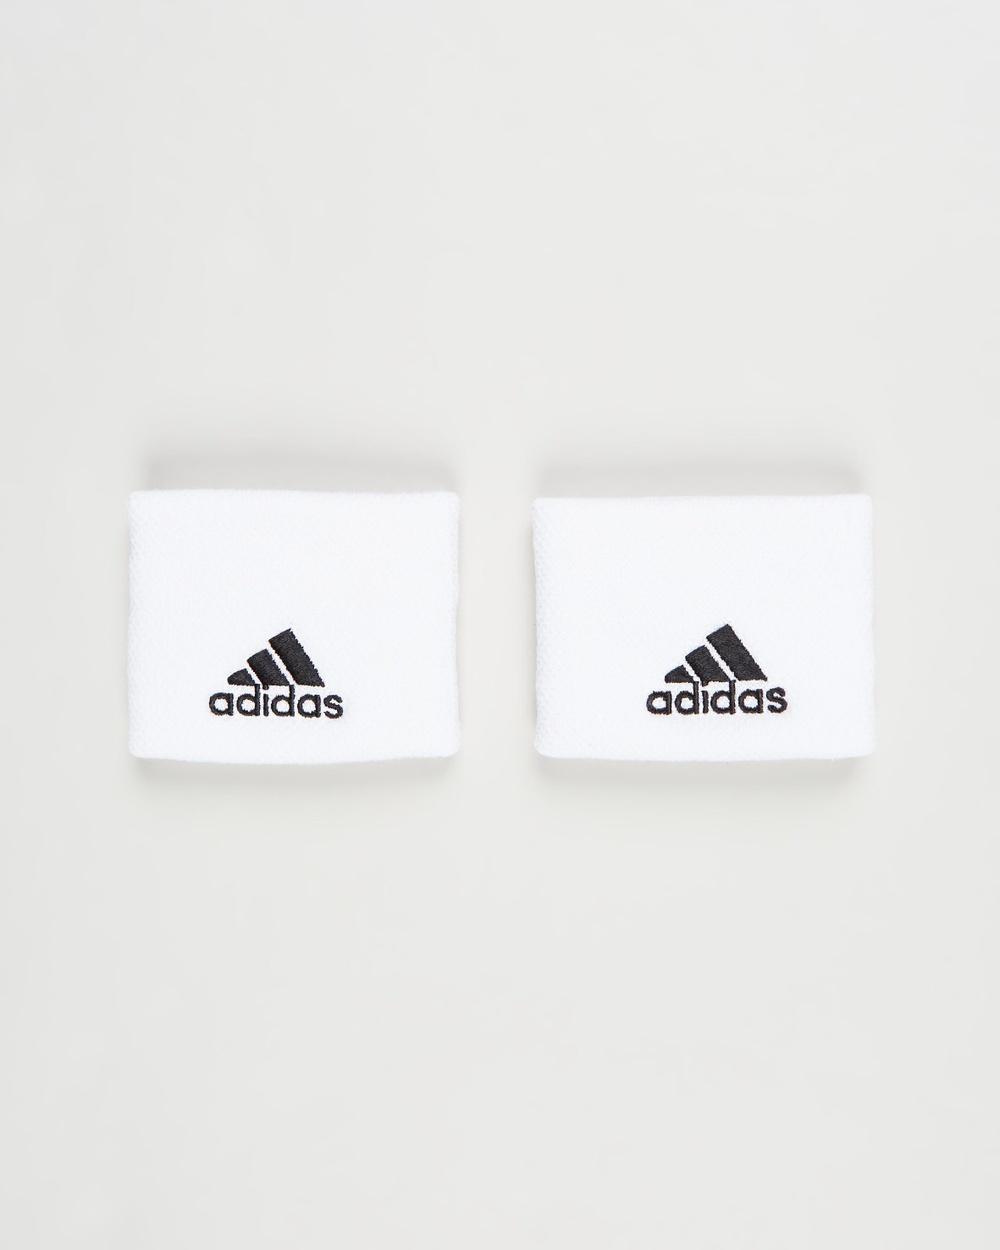 adidas Performance Small Tennis Wristbands Unisex Sweat Bands White & Black